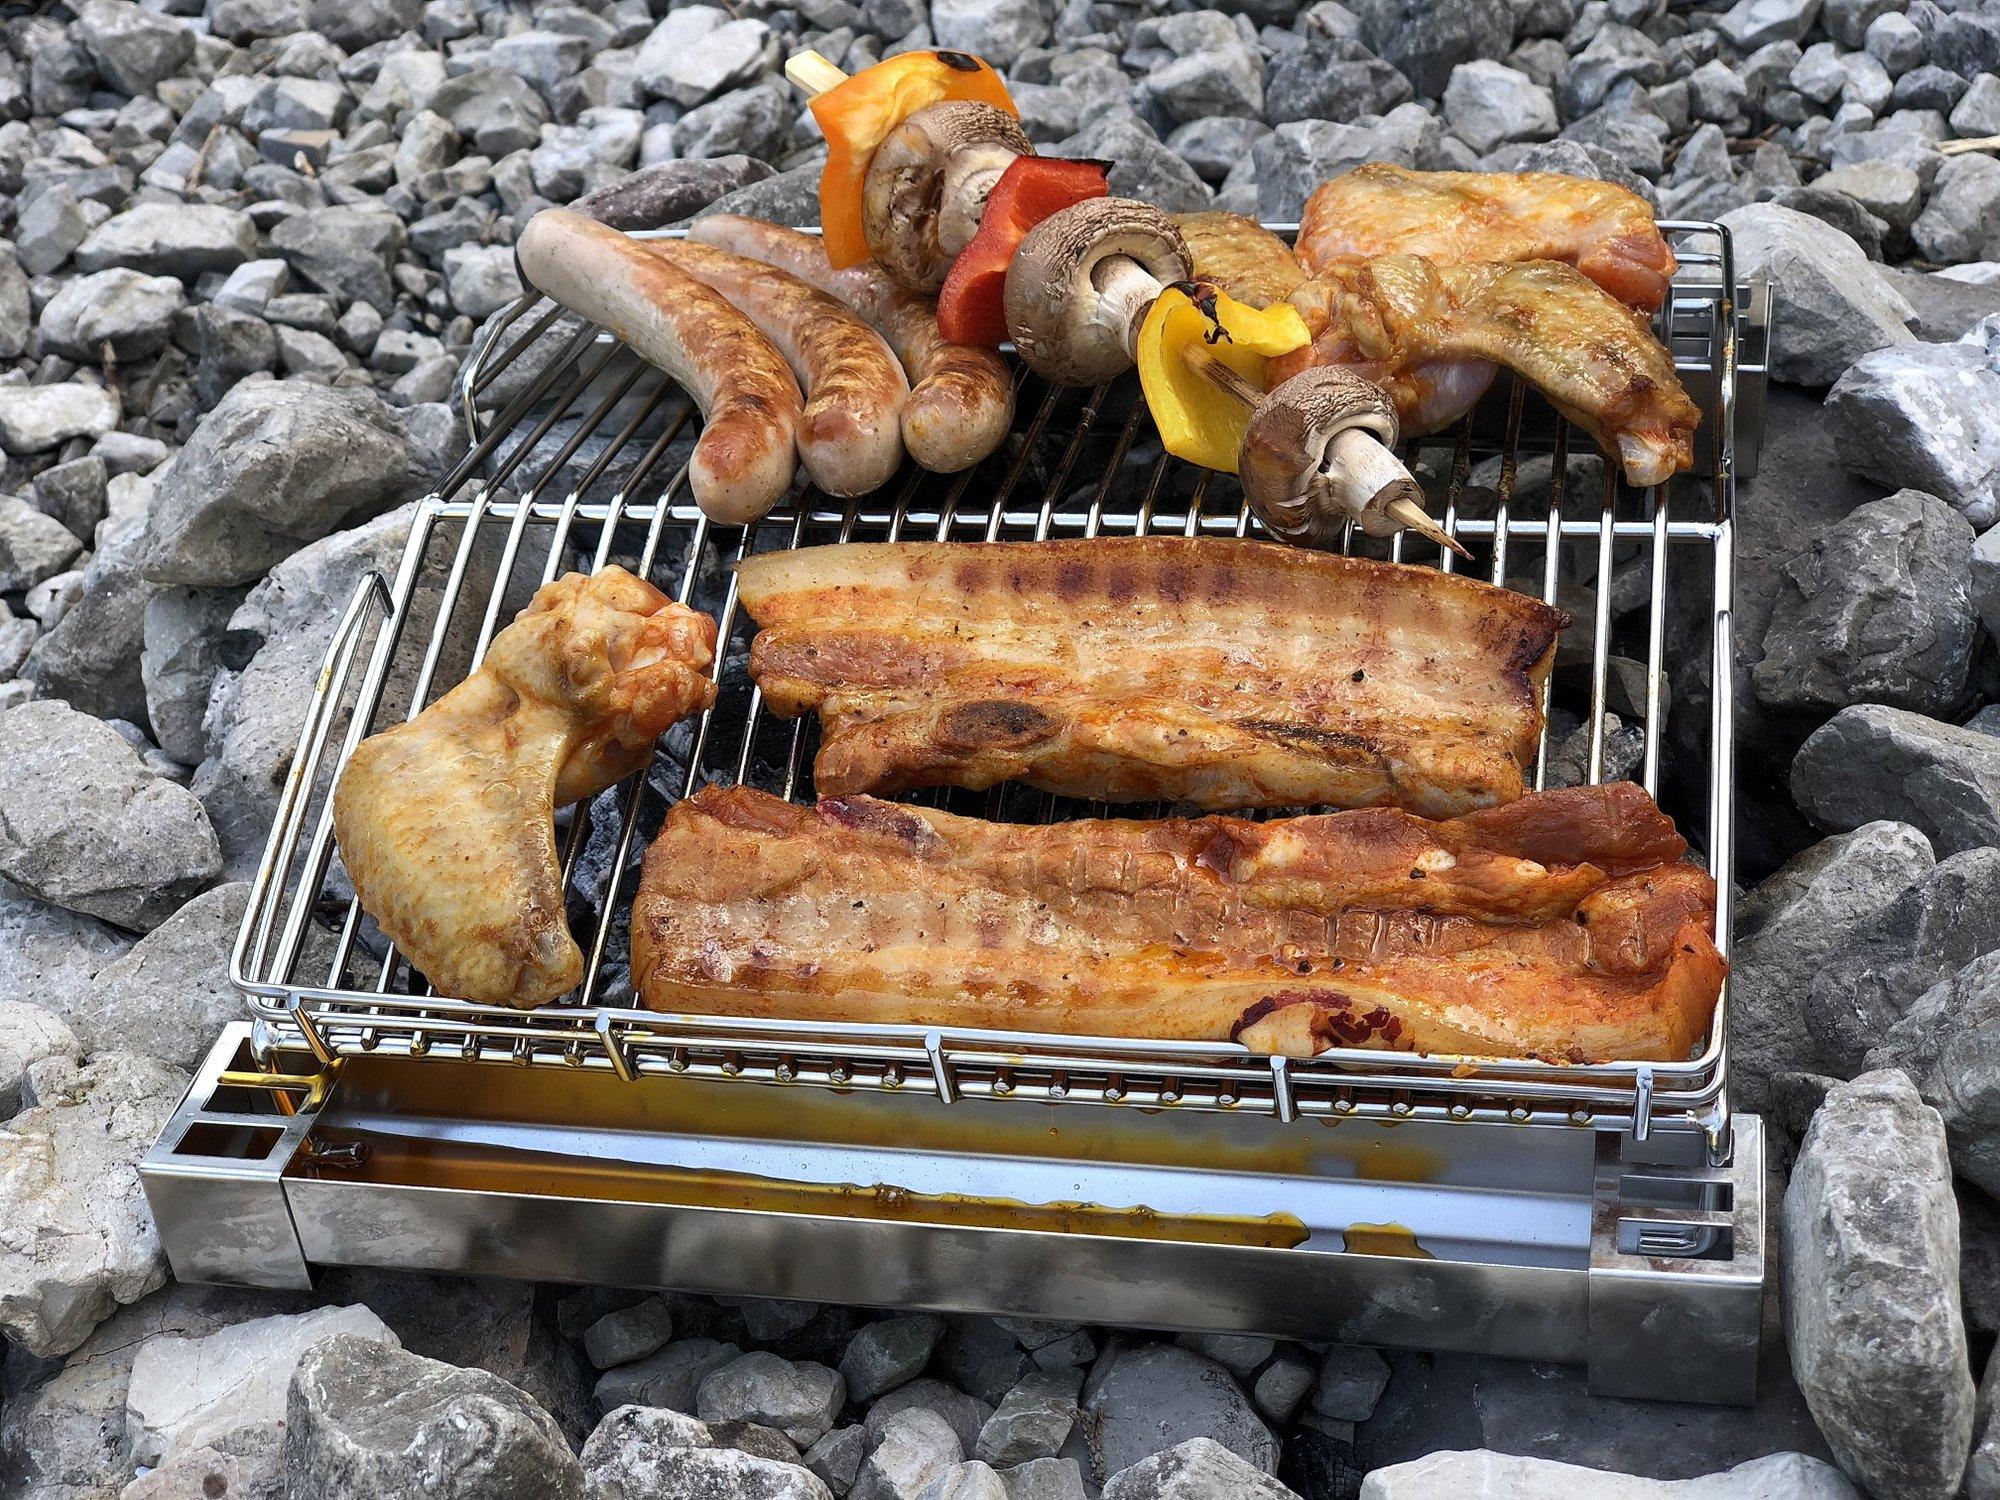 camping grill1 keline größe.jpg